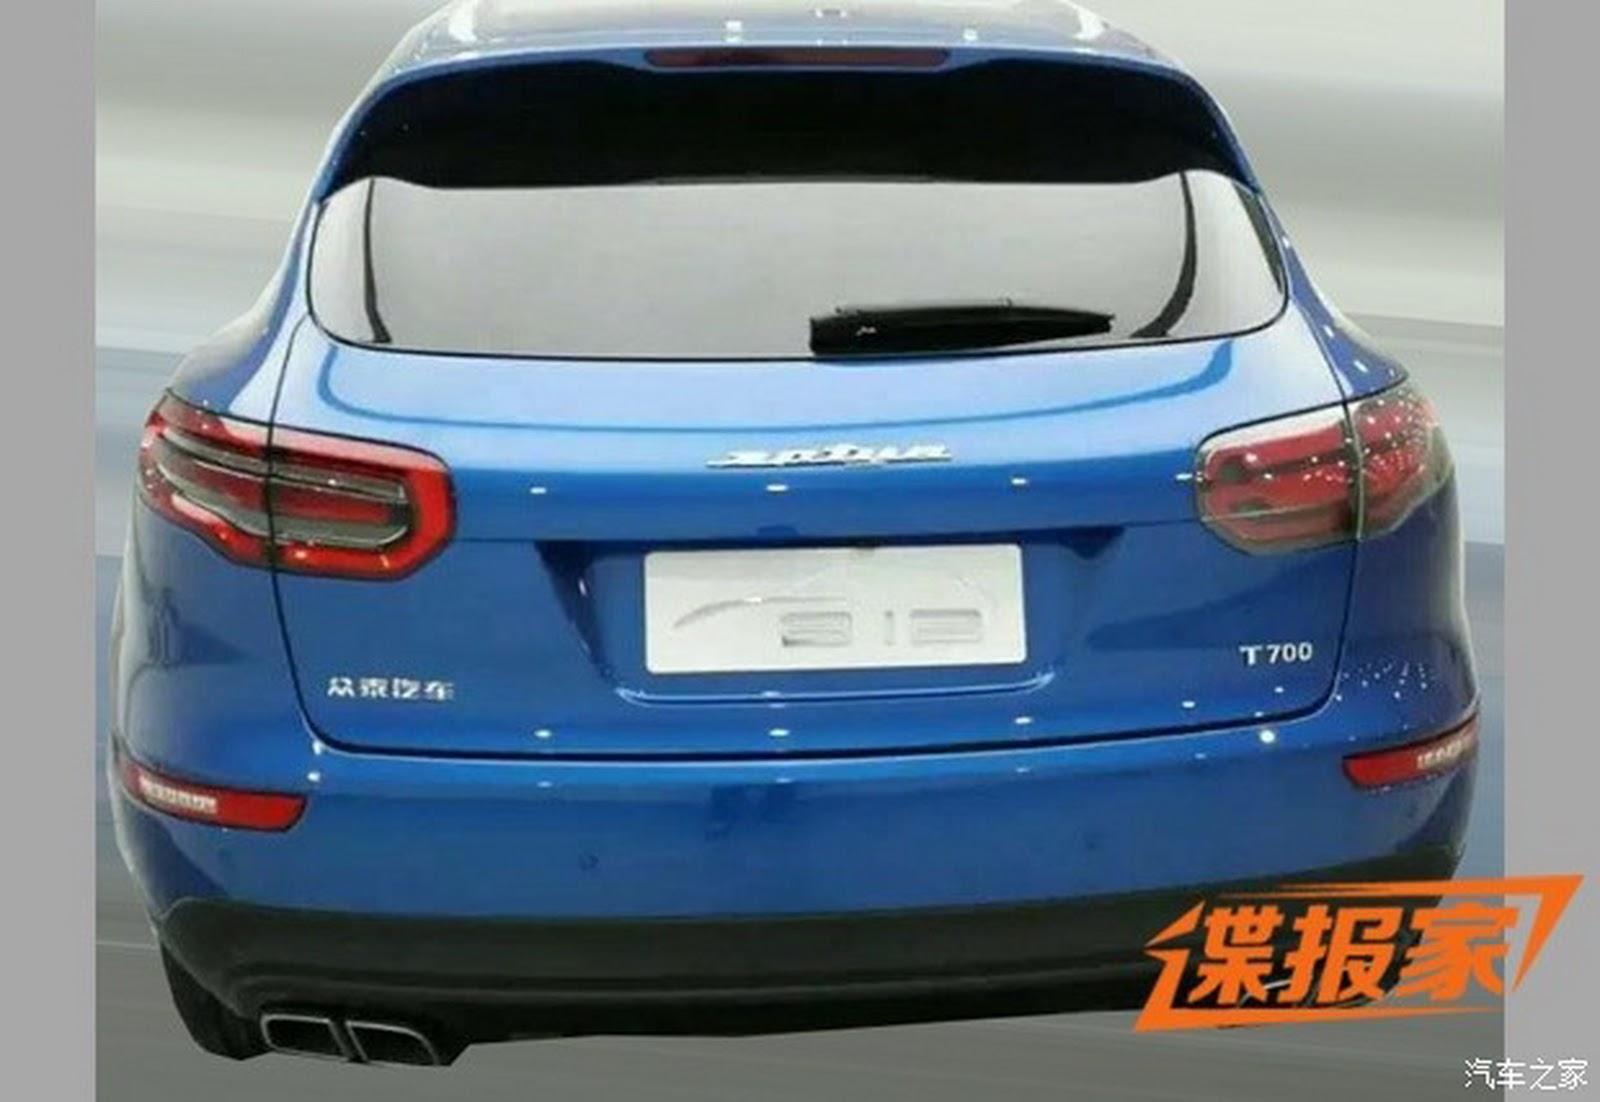 china s zotye clones porsche macan with new t700